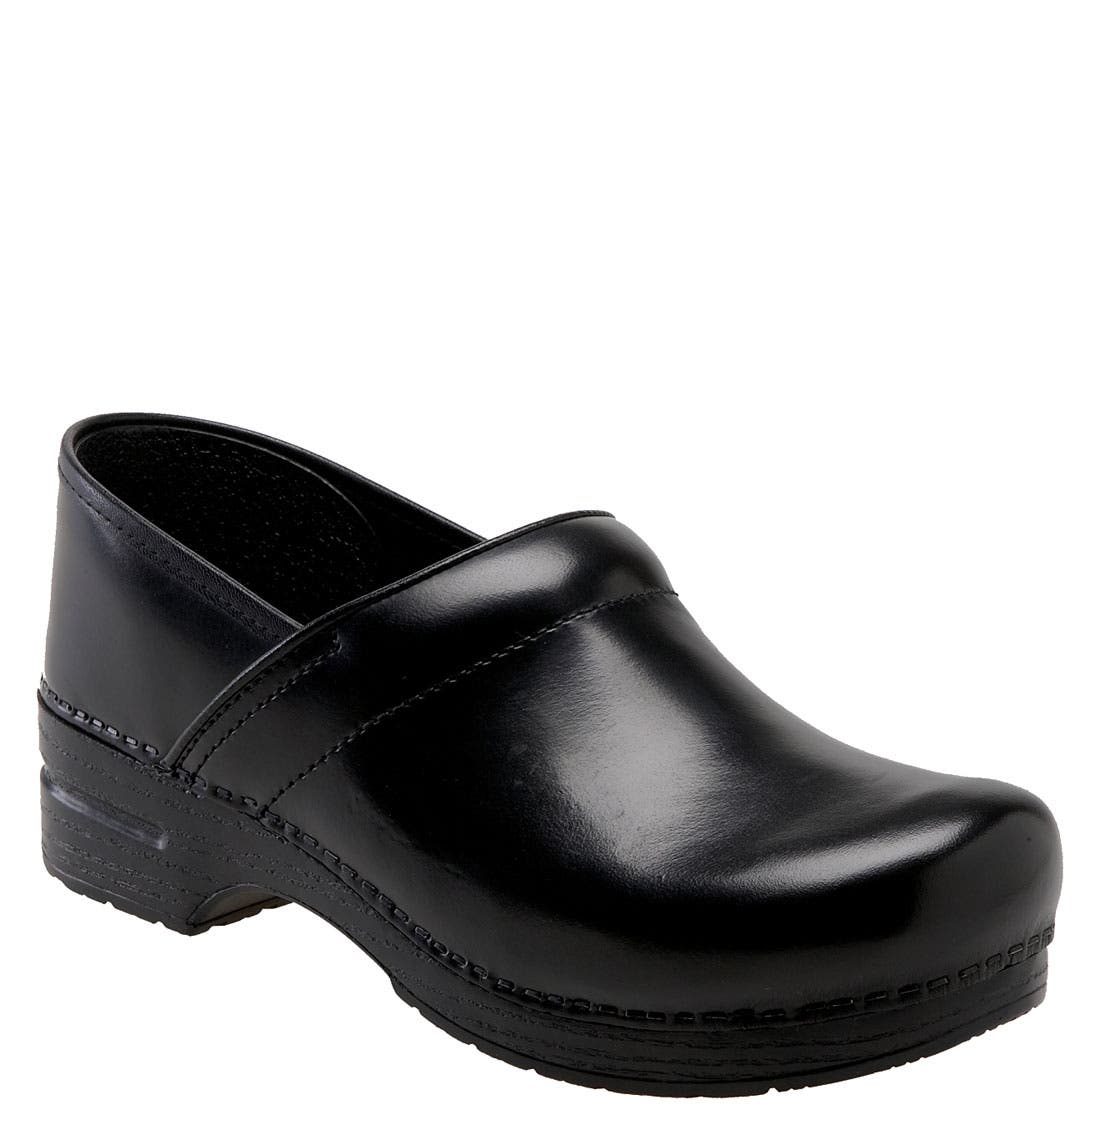 'Professional' Slip-On,                         Main,                         color, Black Cabrio